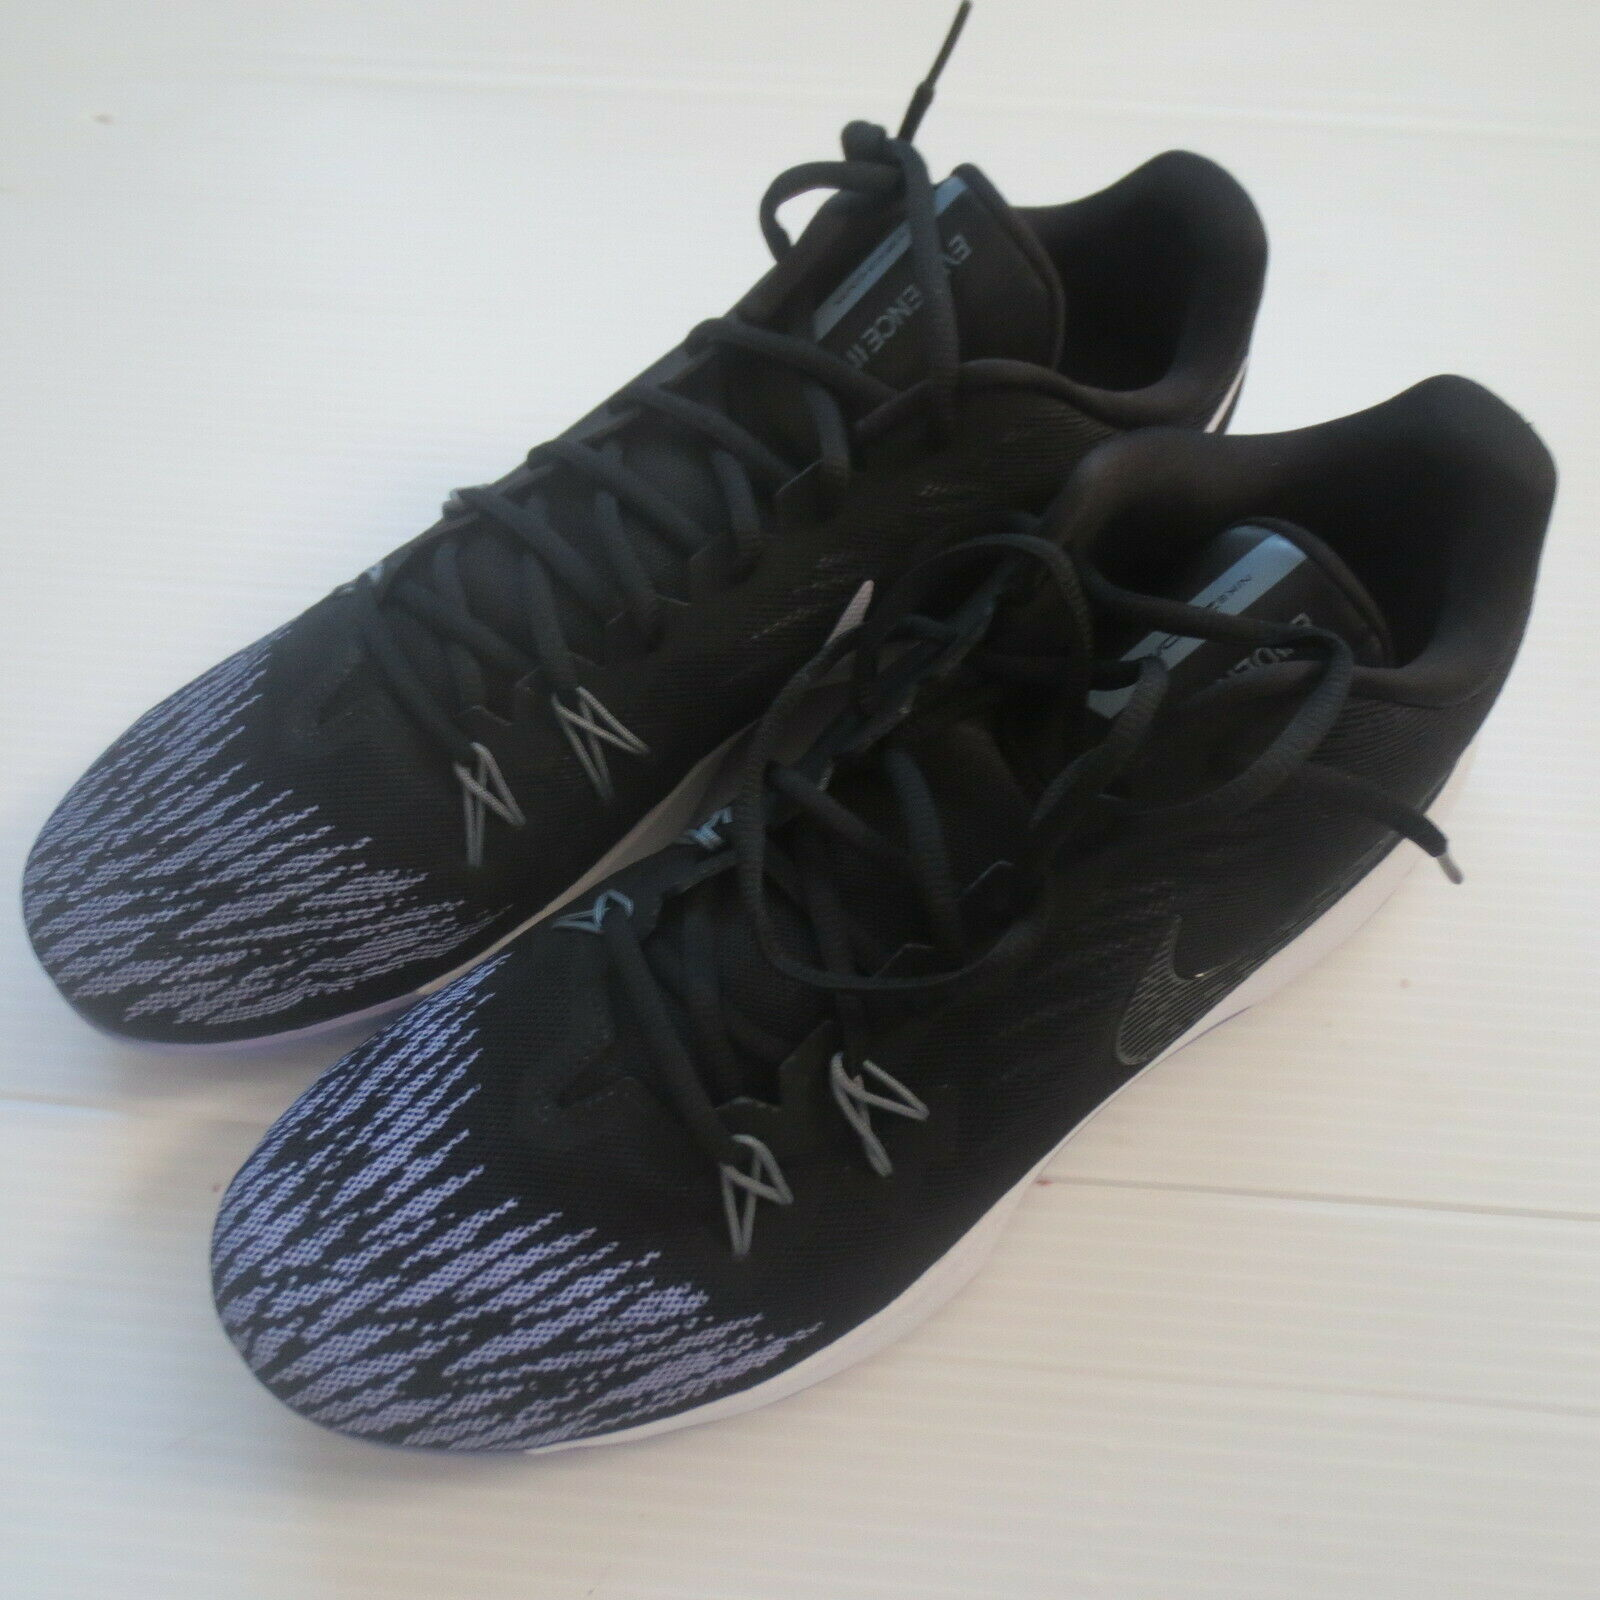 Nike Zoom Evidence II Shoes - 908976 - Black Lavender 105 - Size 14 - NEW image 5